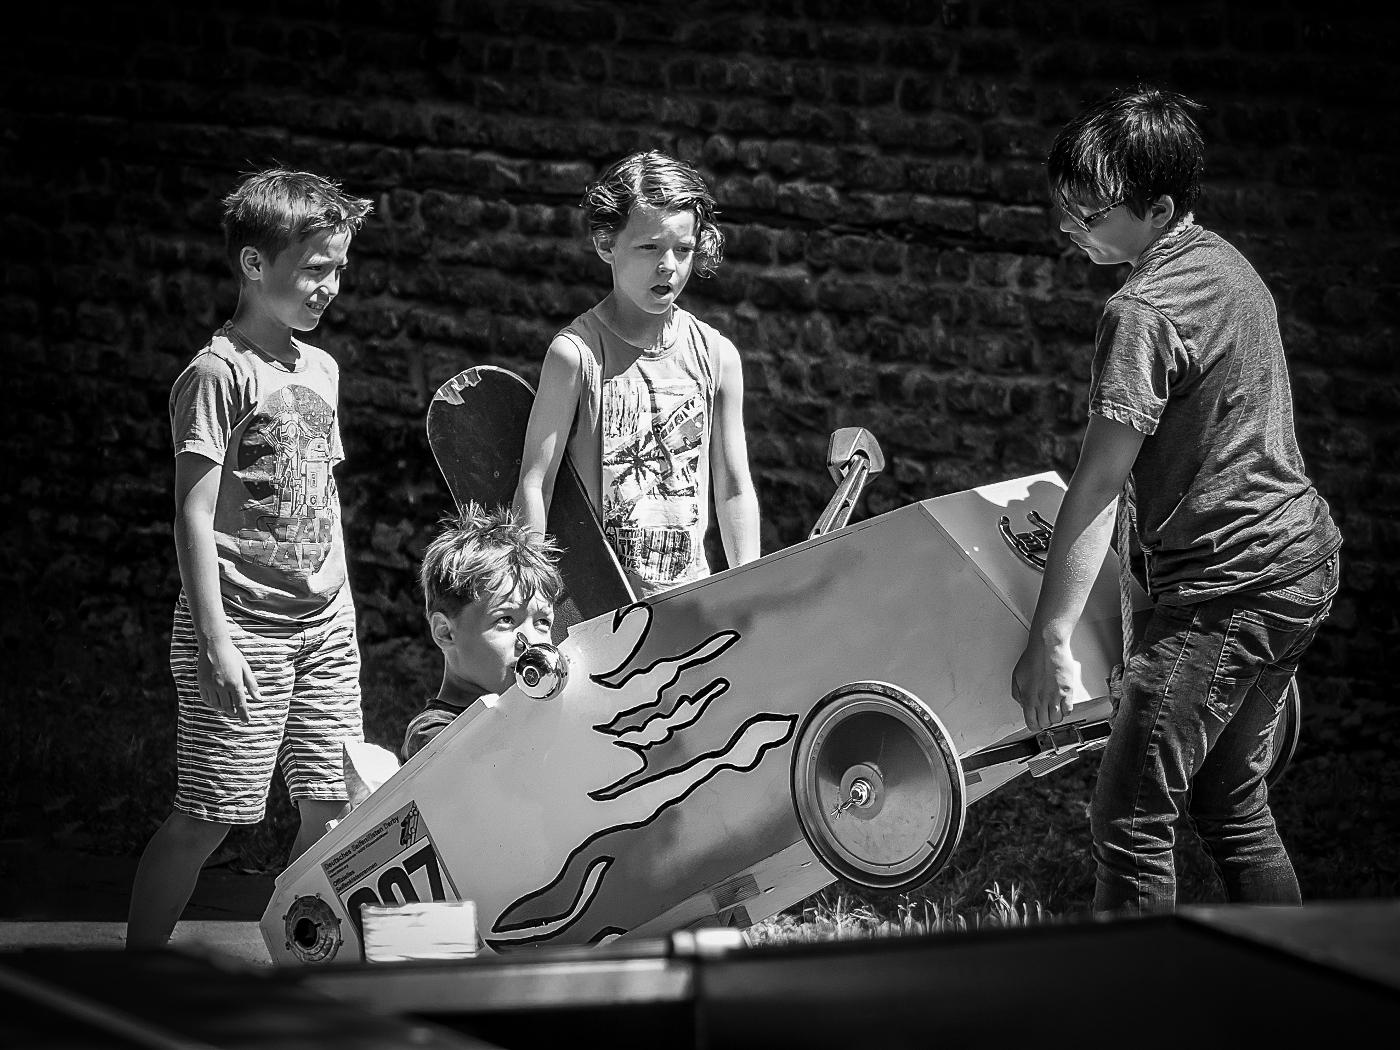 Start zum Seifenkistenrennen    ©  Wolfgang Röser